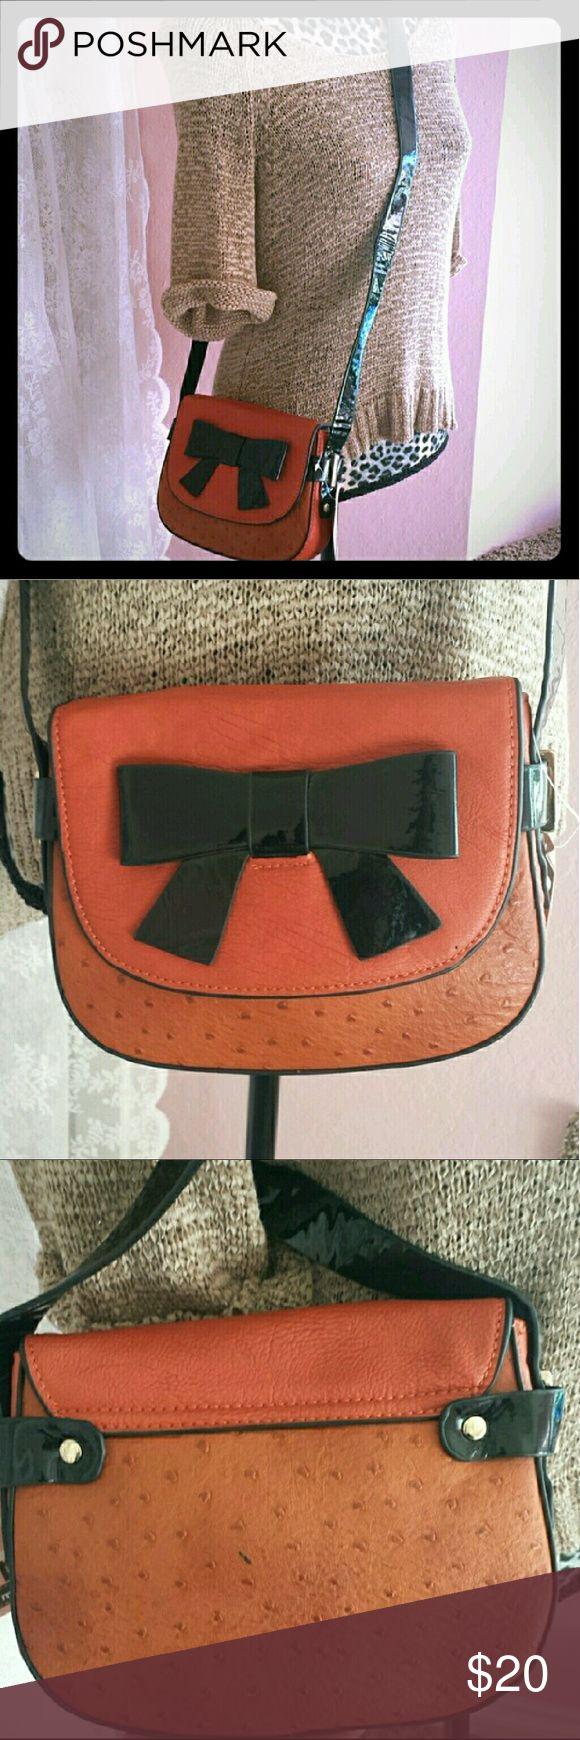 Melie bianco On hold for @lokai Melie Bianco Bags Crossbody Bags